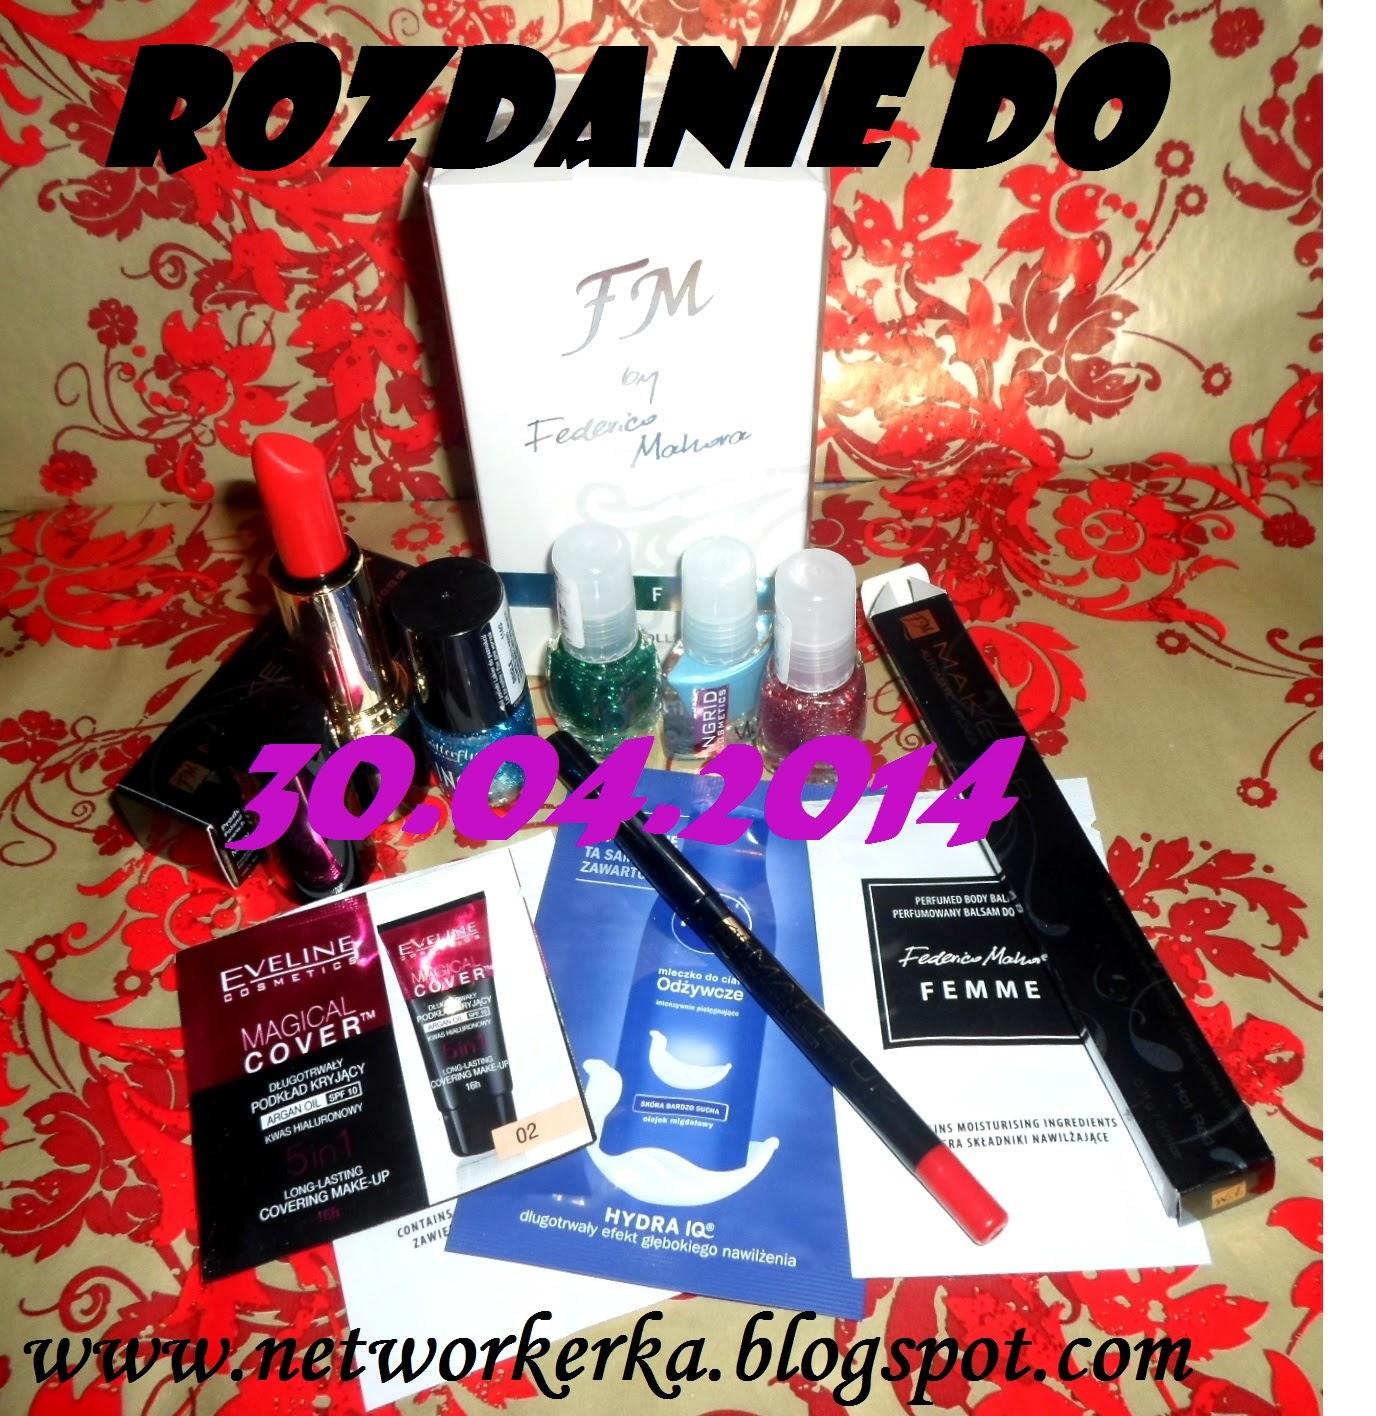 http://networkerka.blogspot.com/2014/03/83-rozdanie-nr-2.html